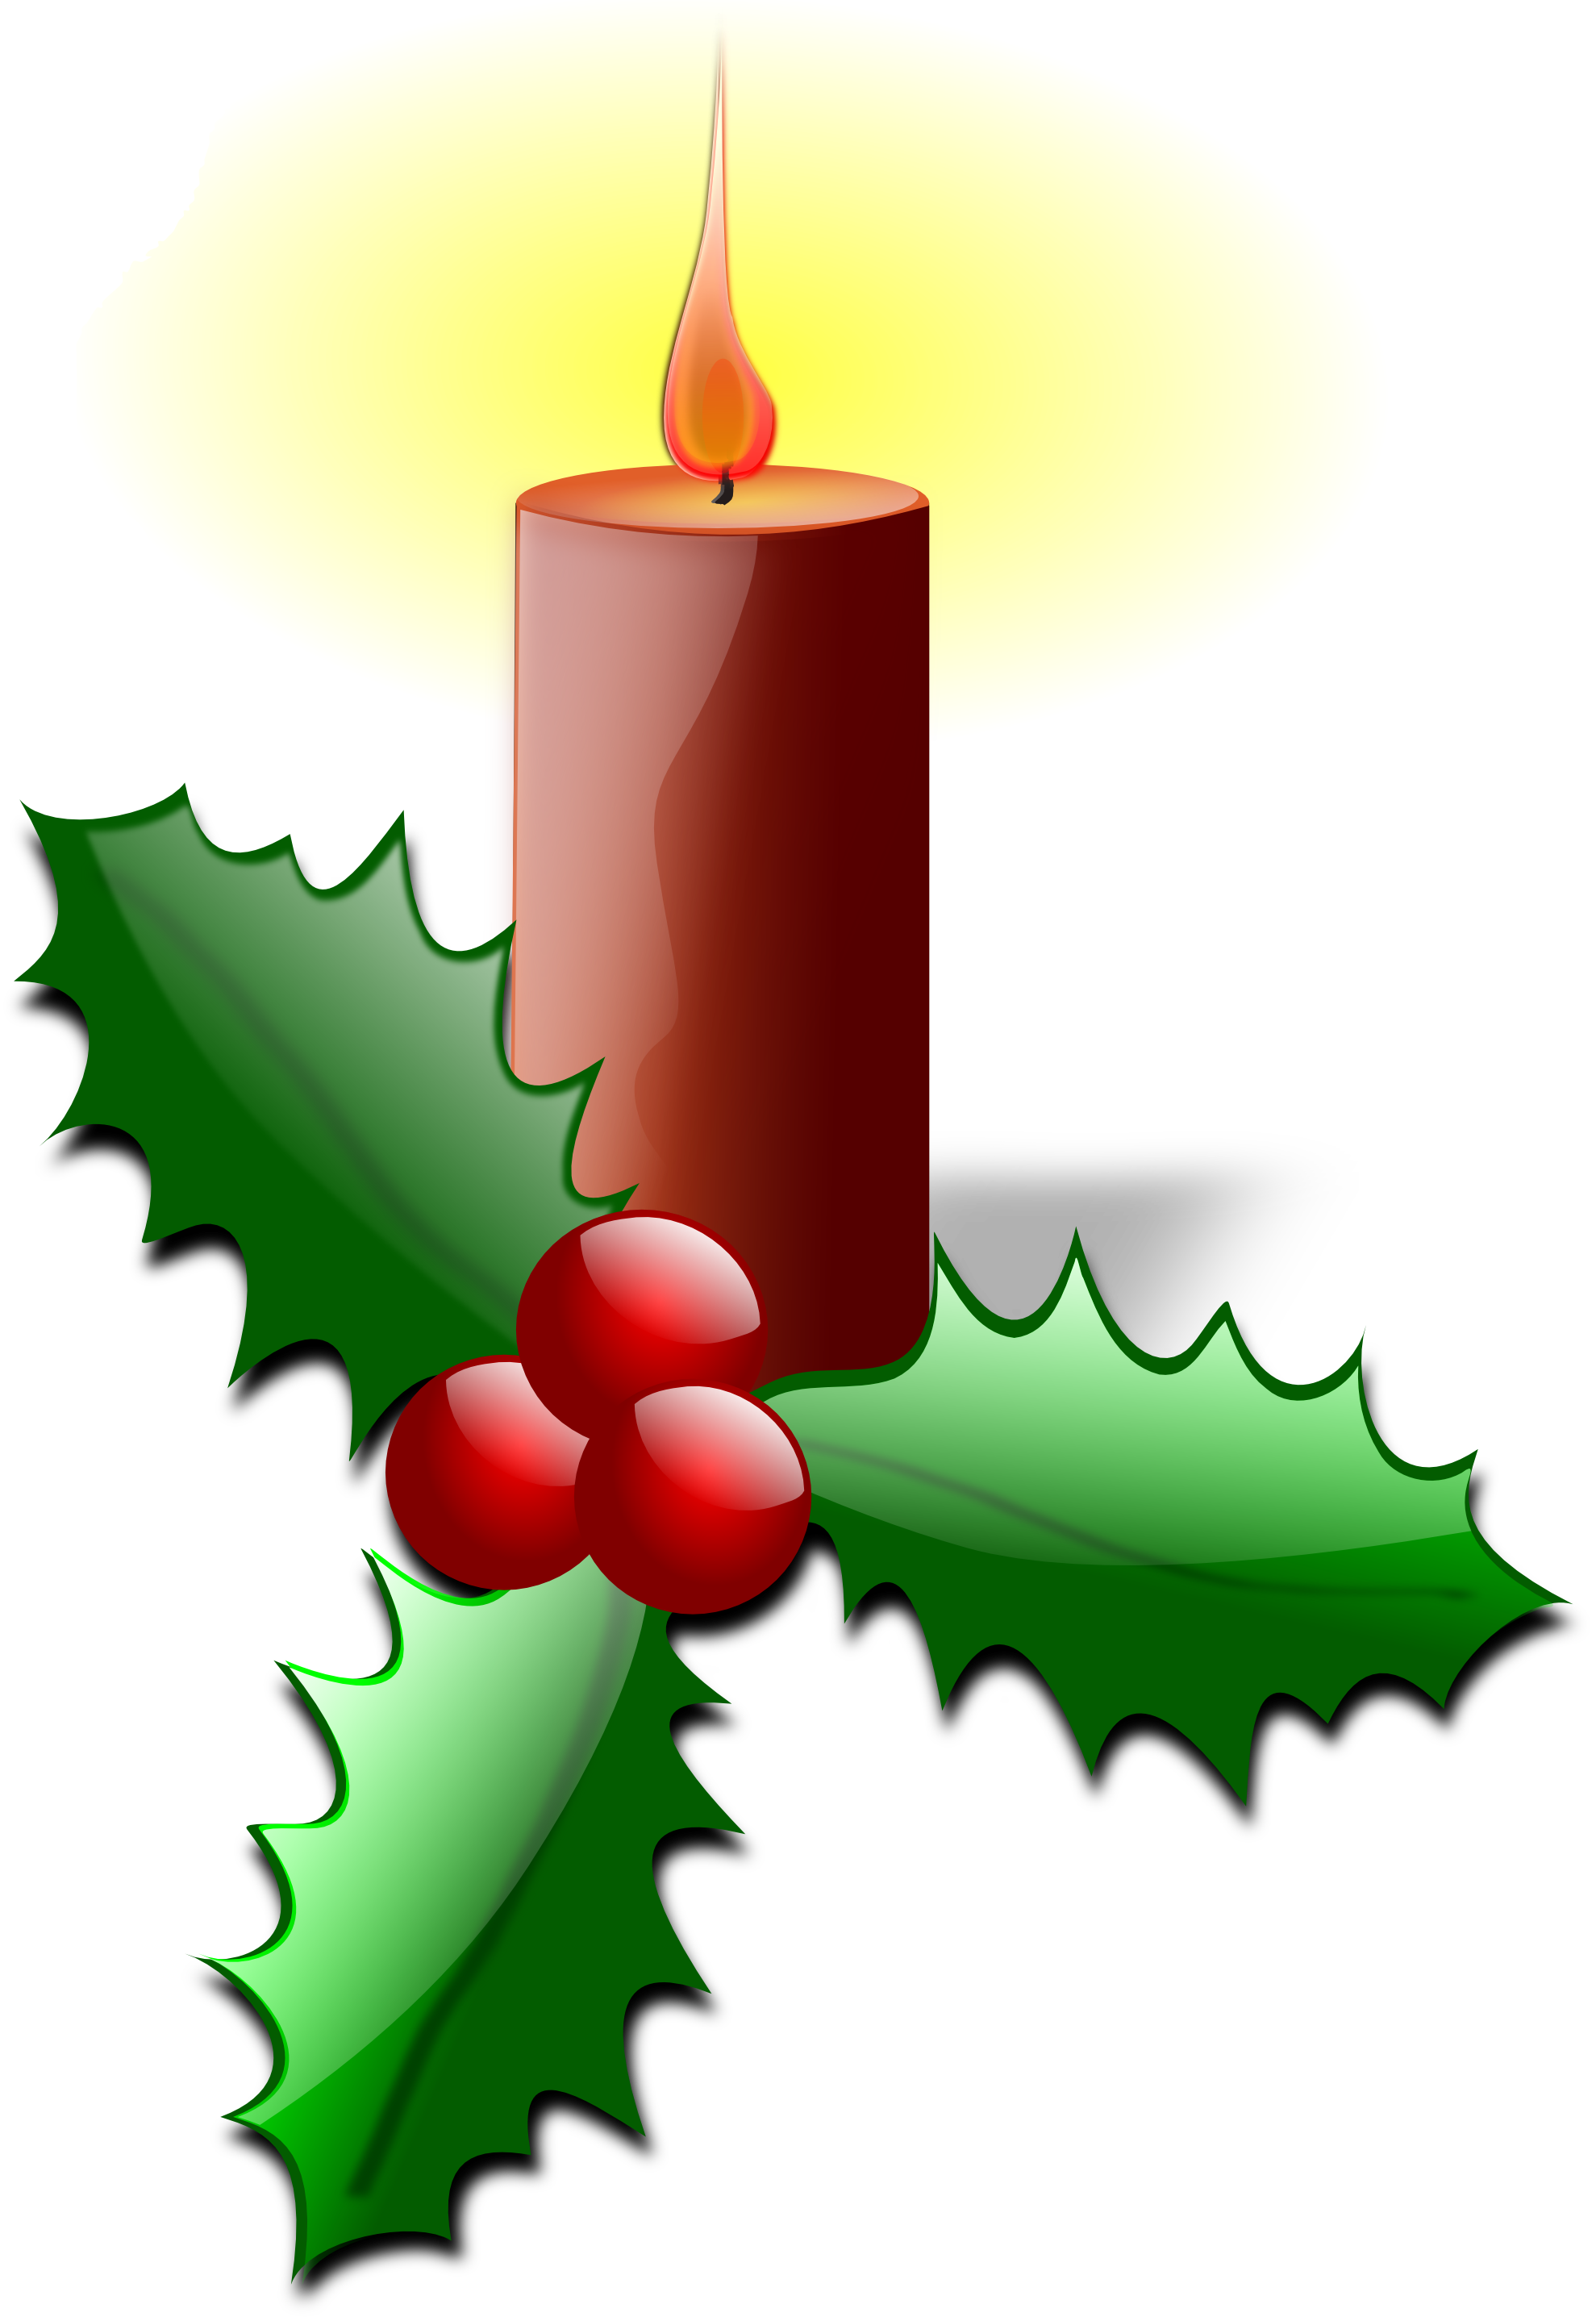 Holiday Clip Art Christmas Lights Free Clipart, Christmas Holiday.